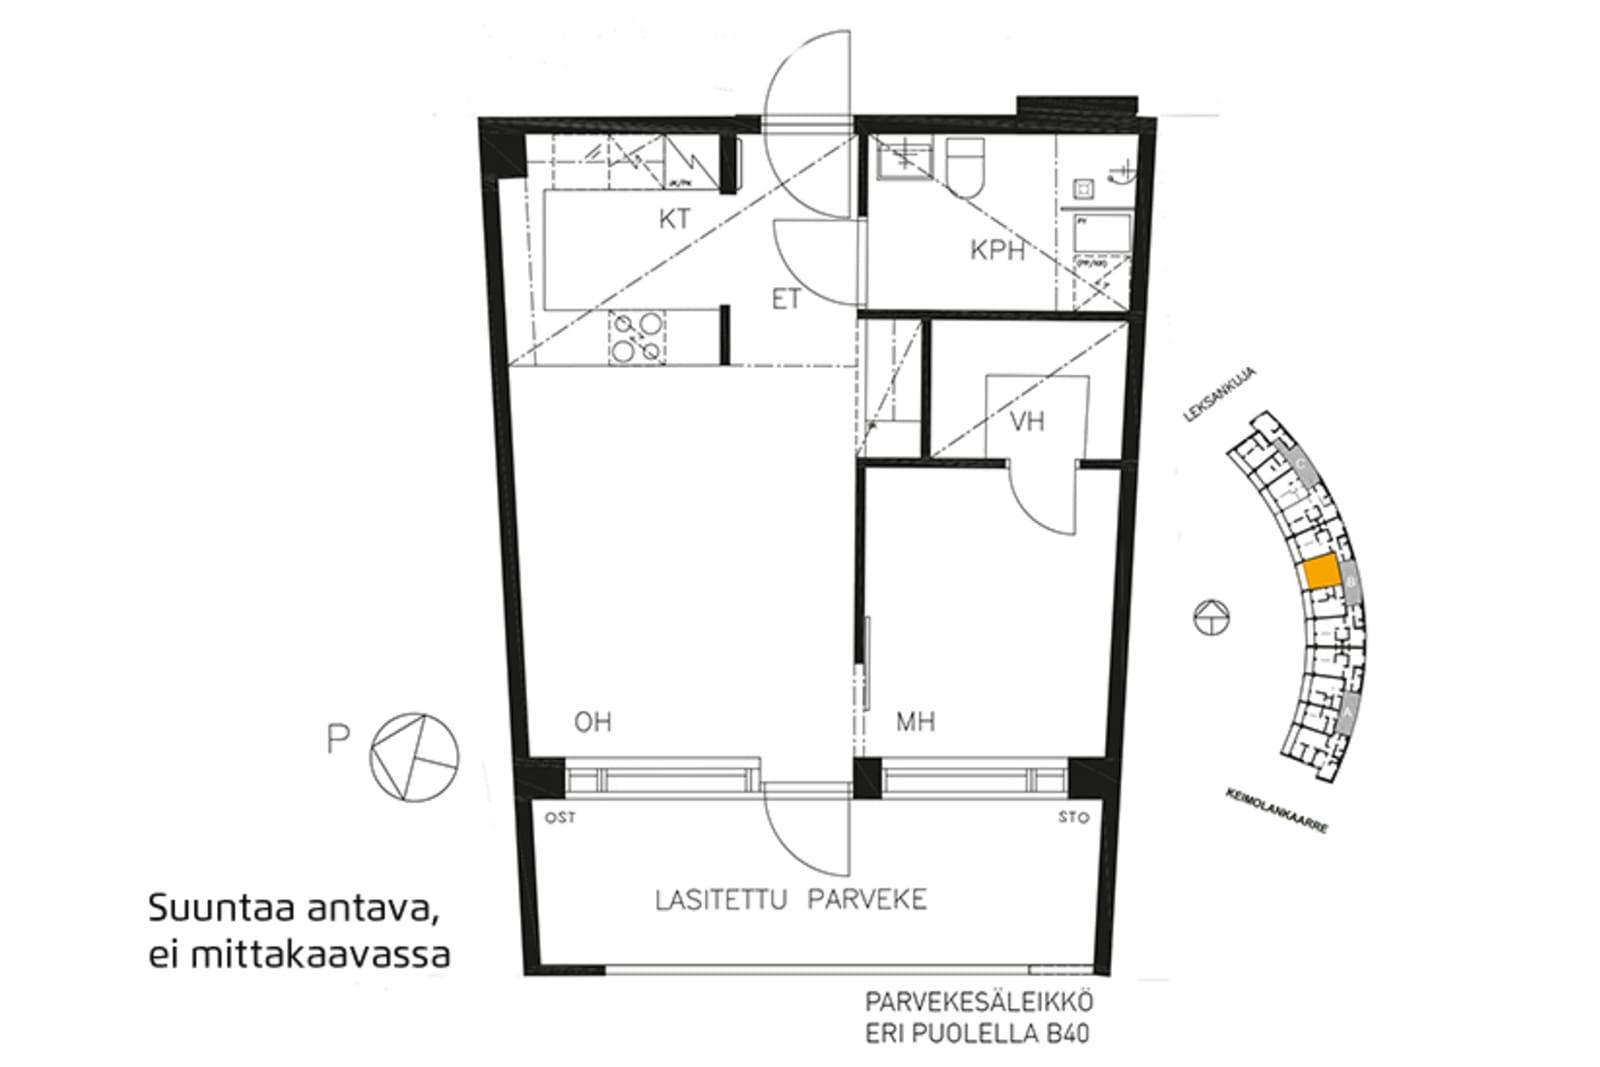 Vantaa, Keimolanmäki, Leksankuja 3 B 036